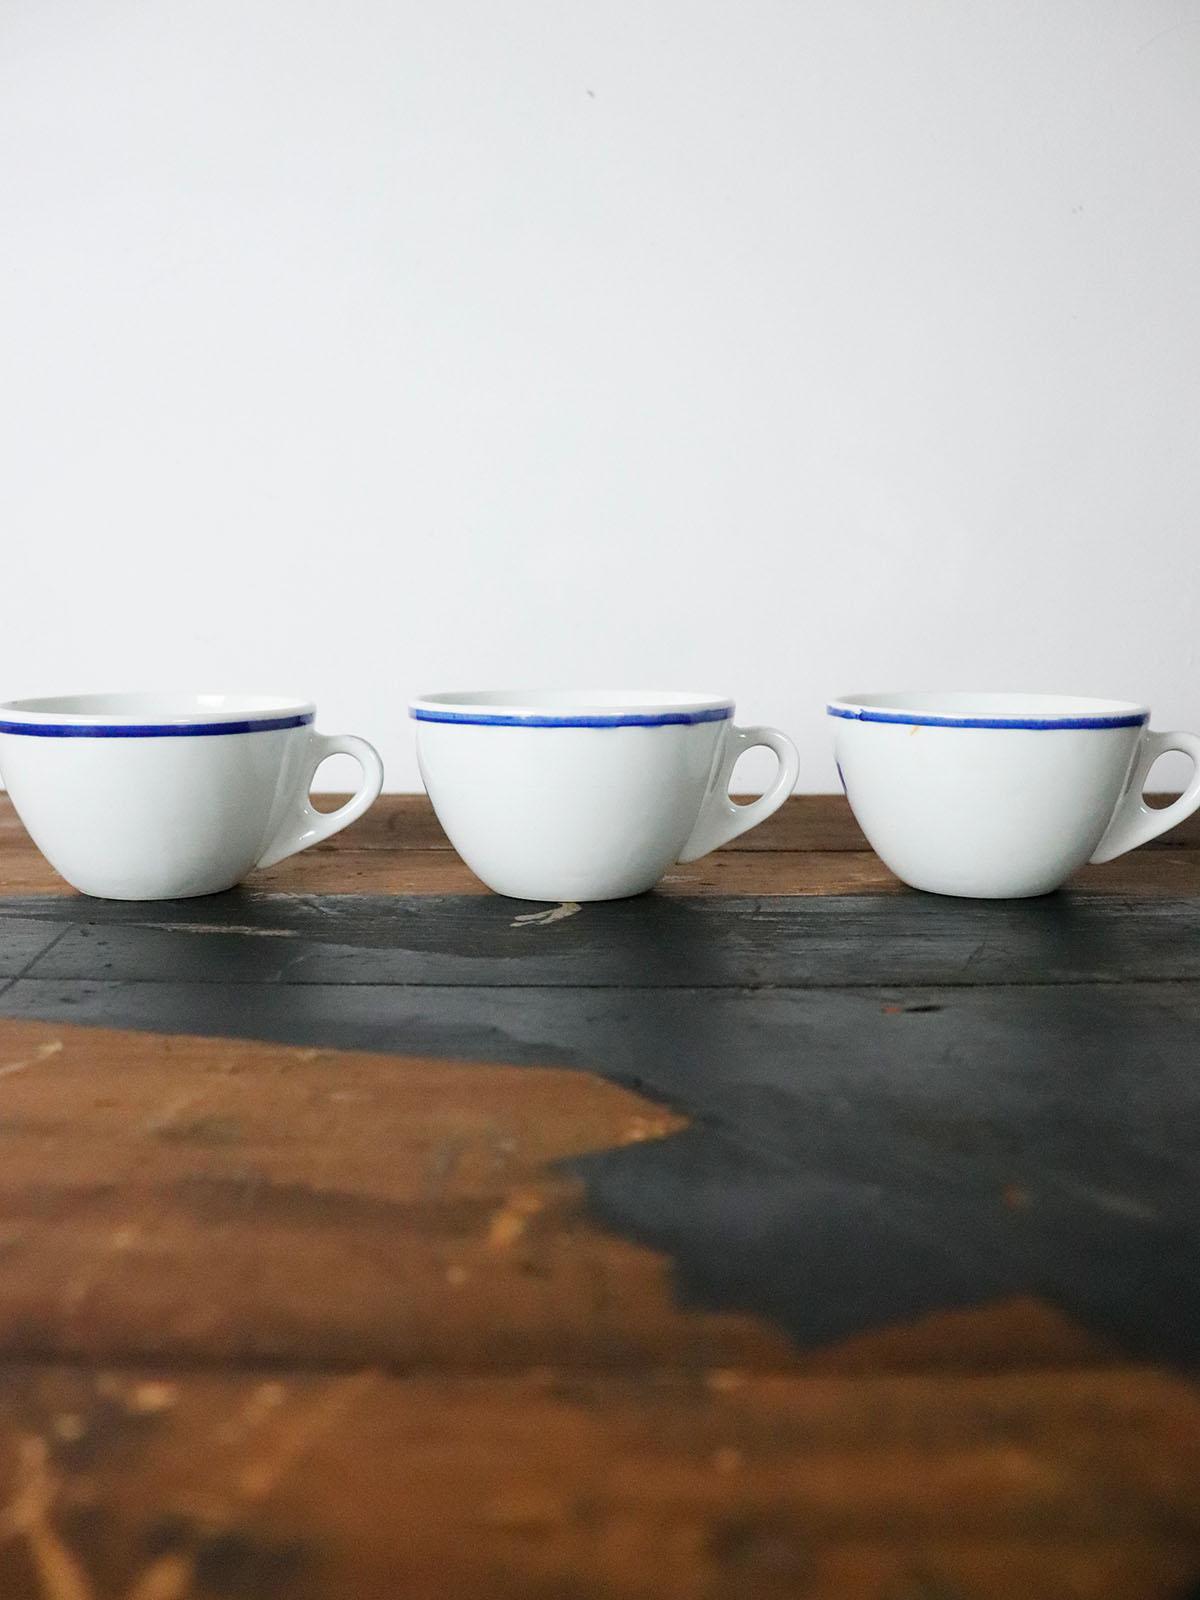 1950's,USN,tepco,tea cup,vintage,USA